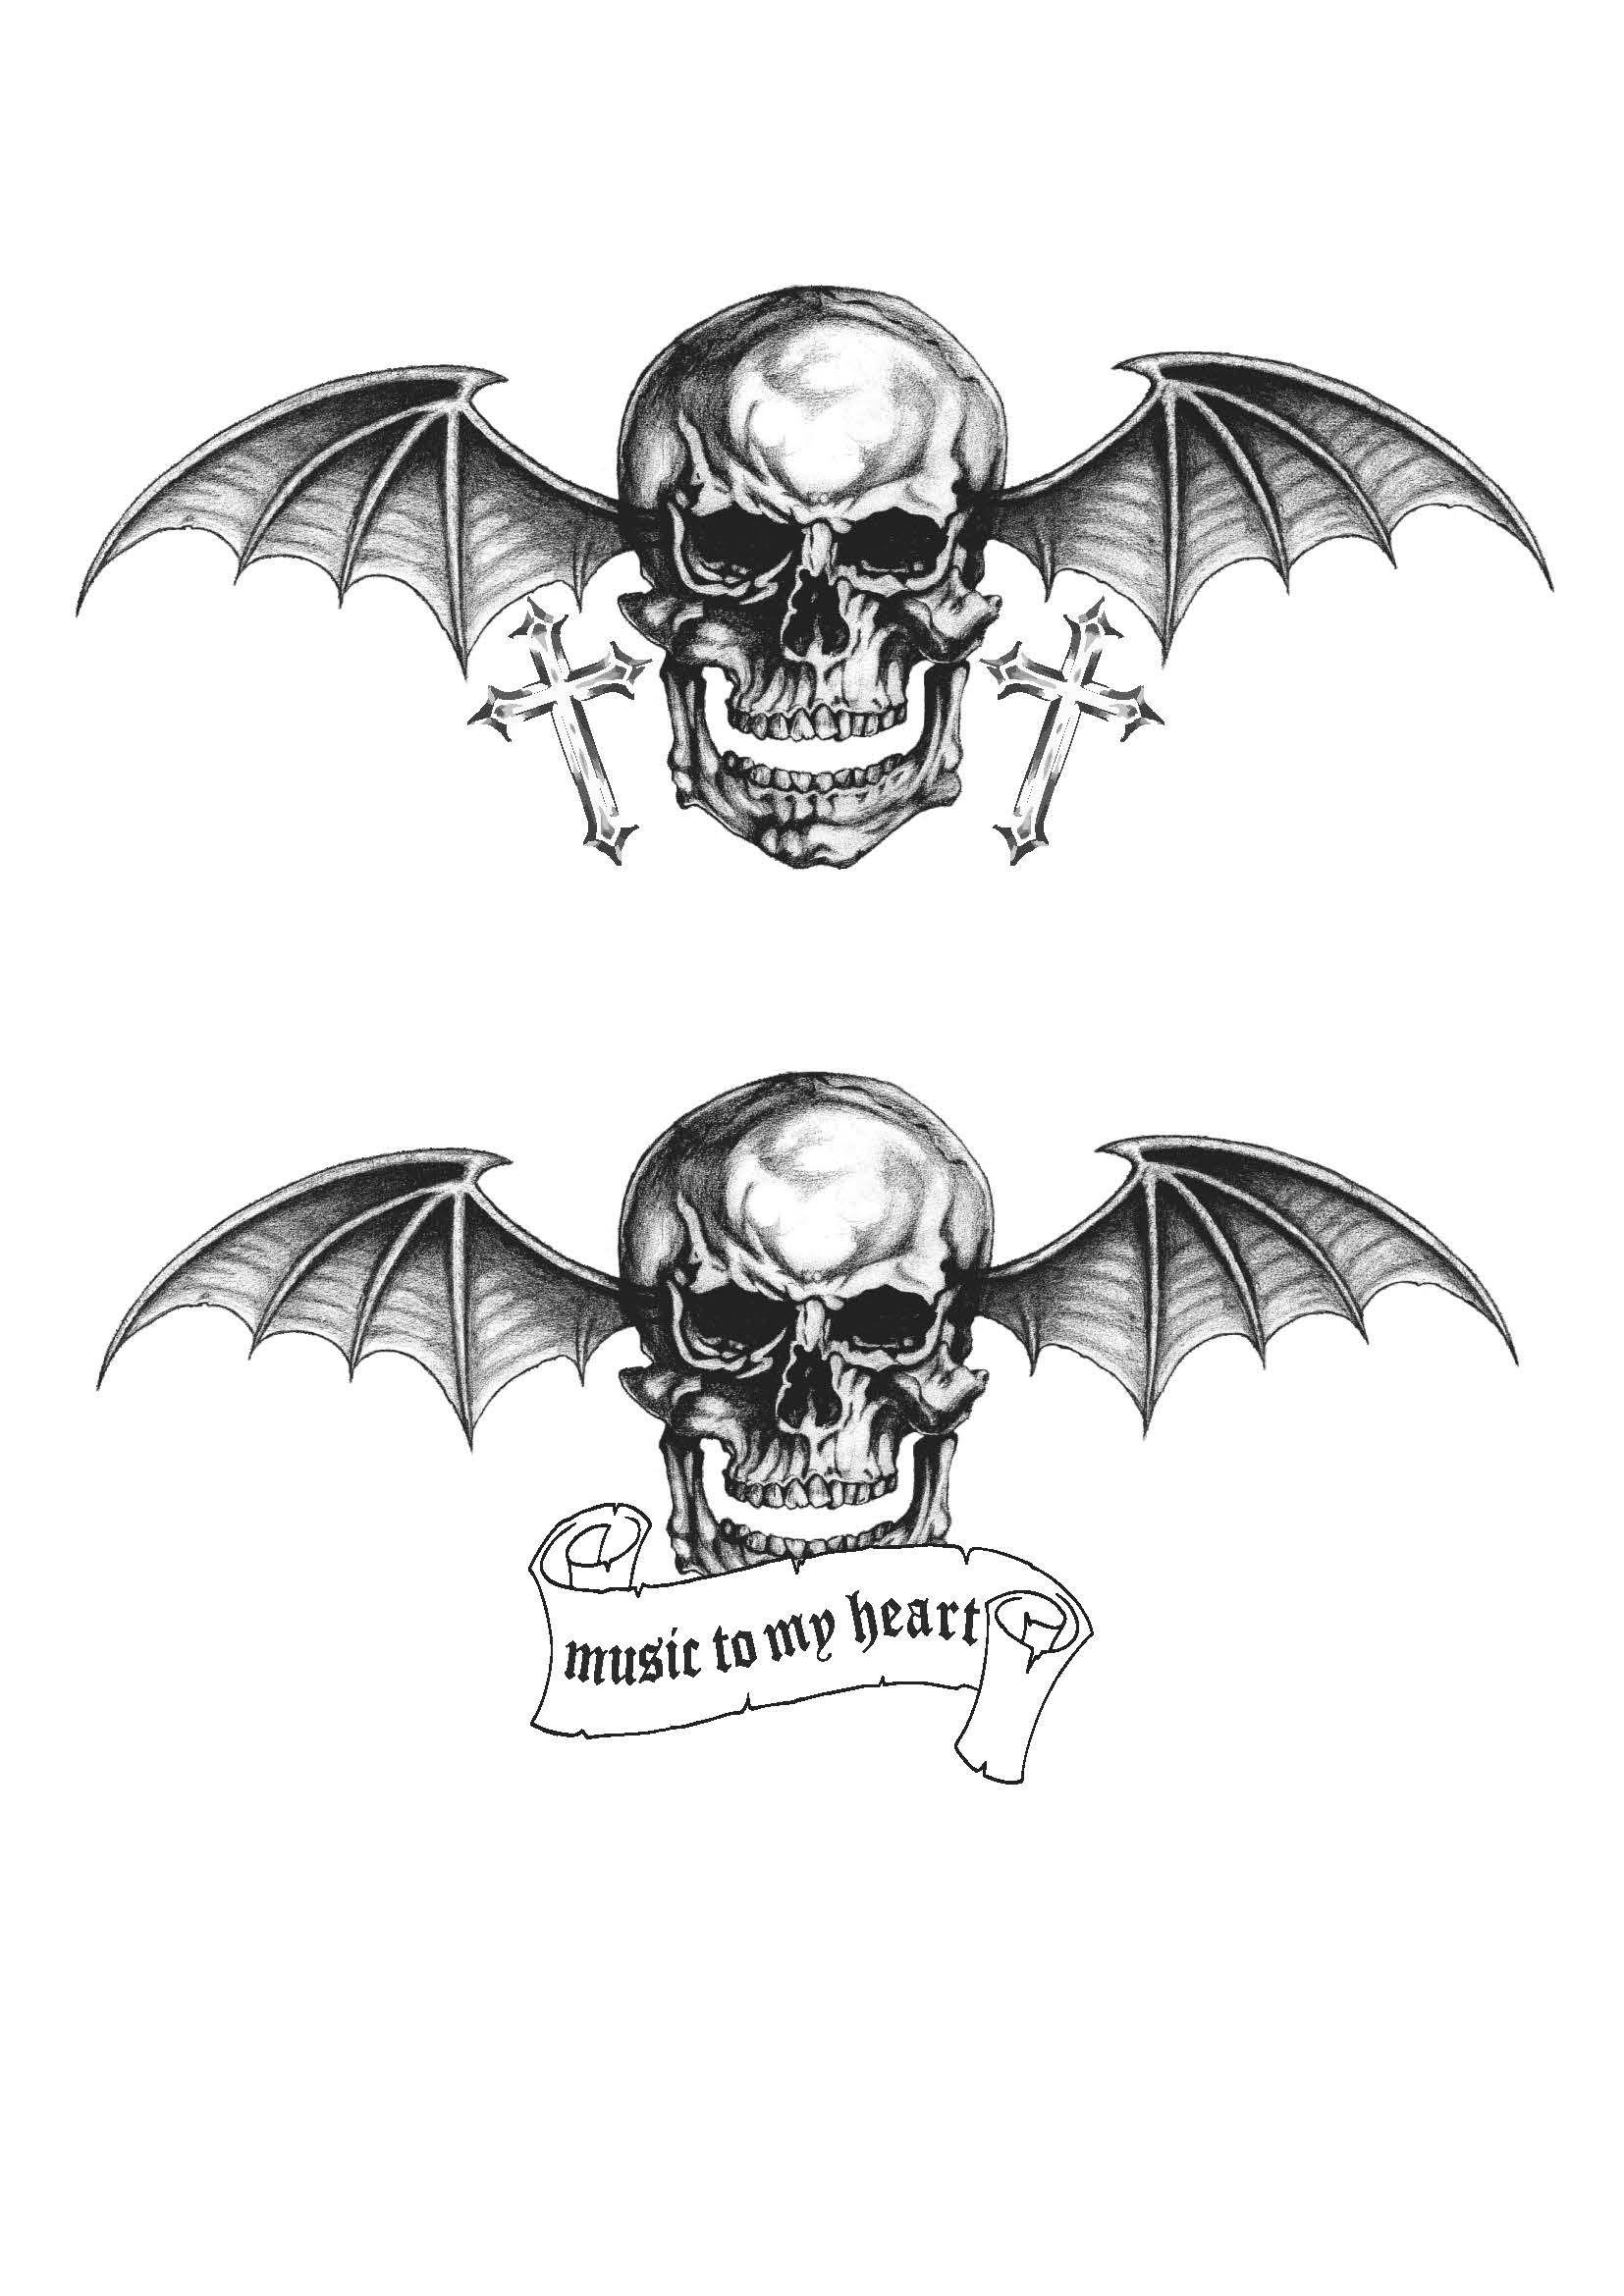 Tattoo Design A7x Avegend Sevenfold Skull Wallpaper Avenged